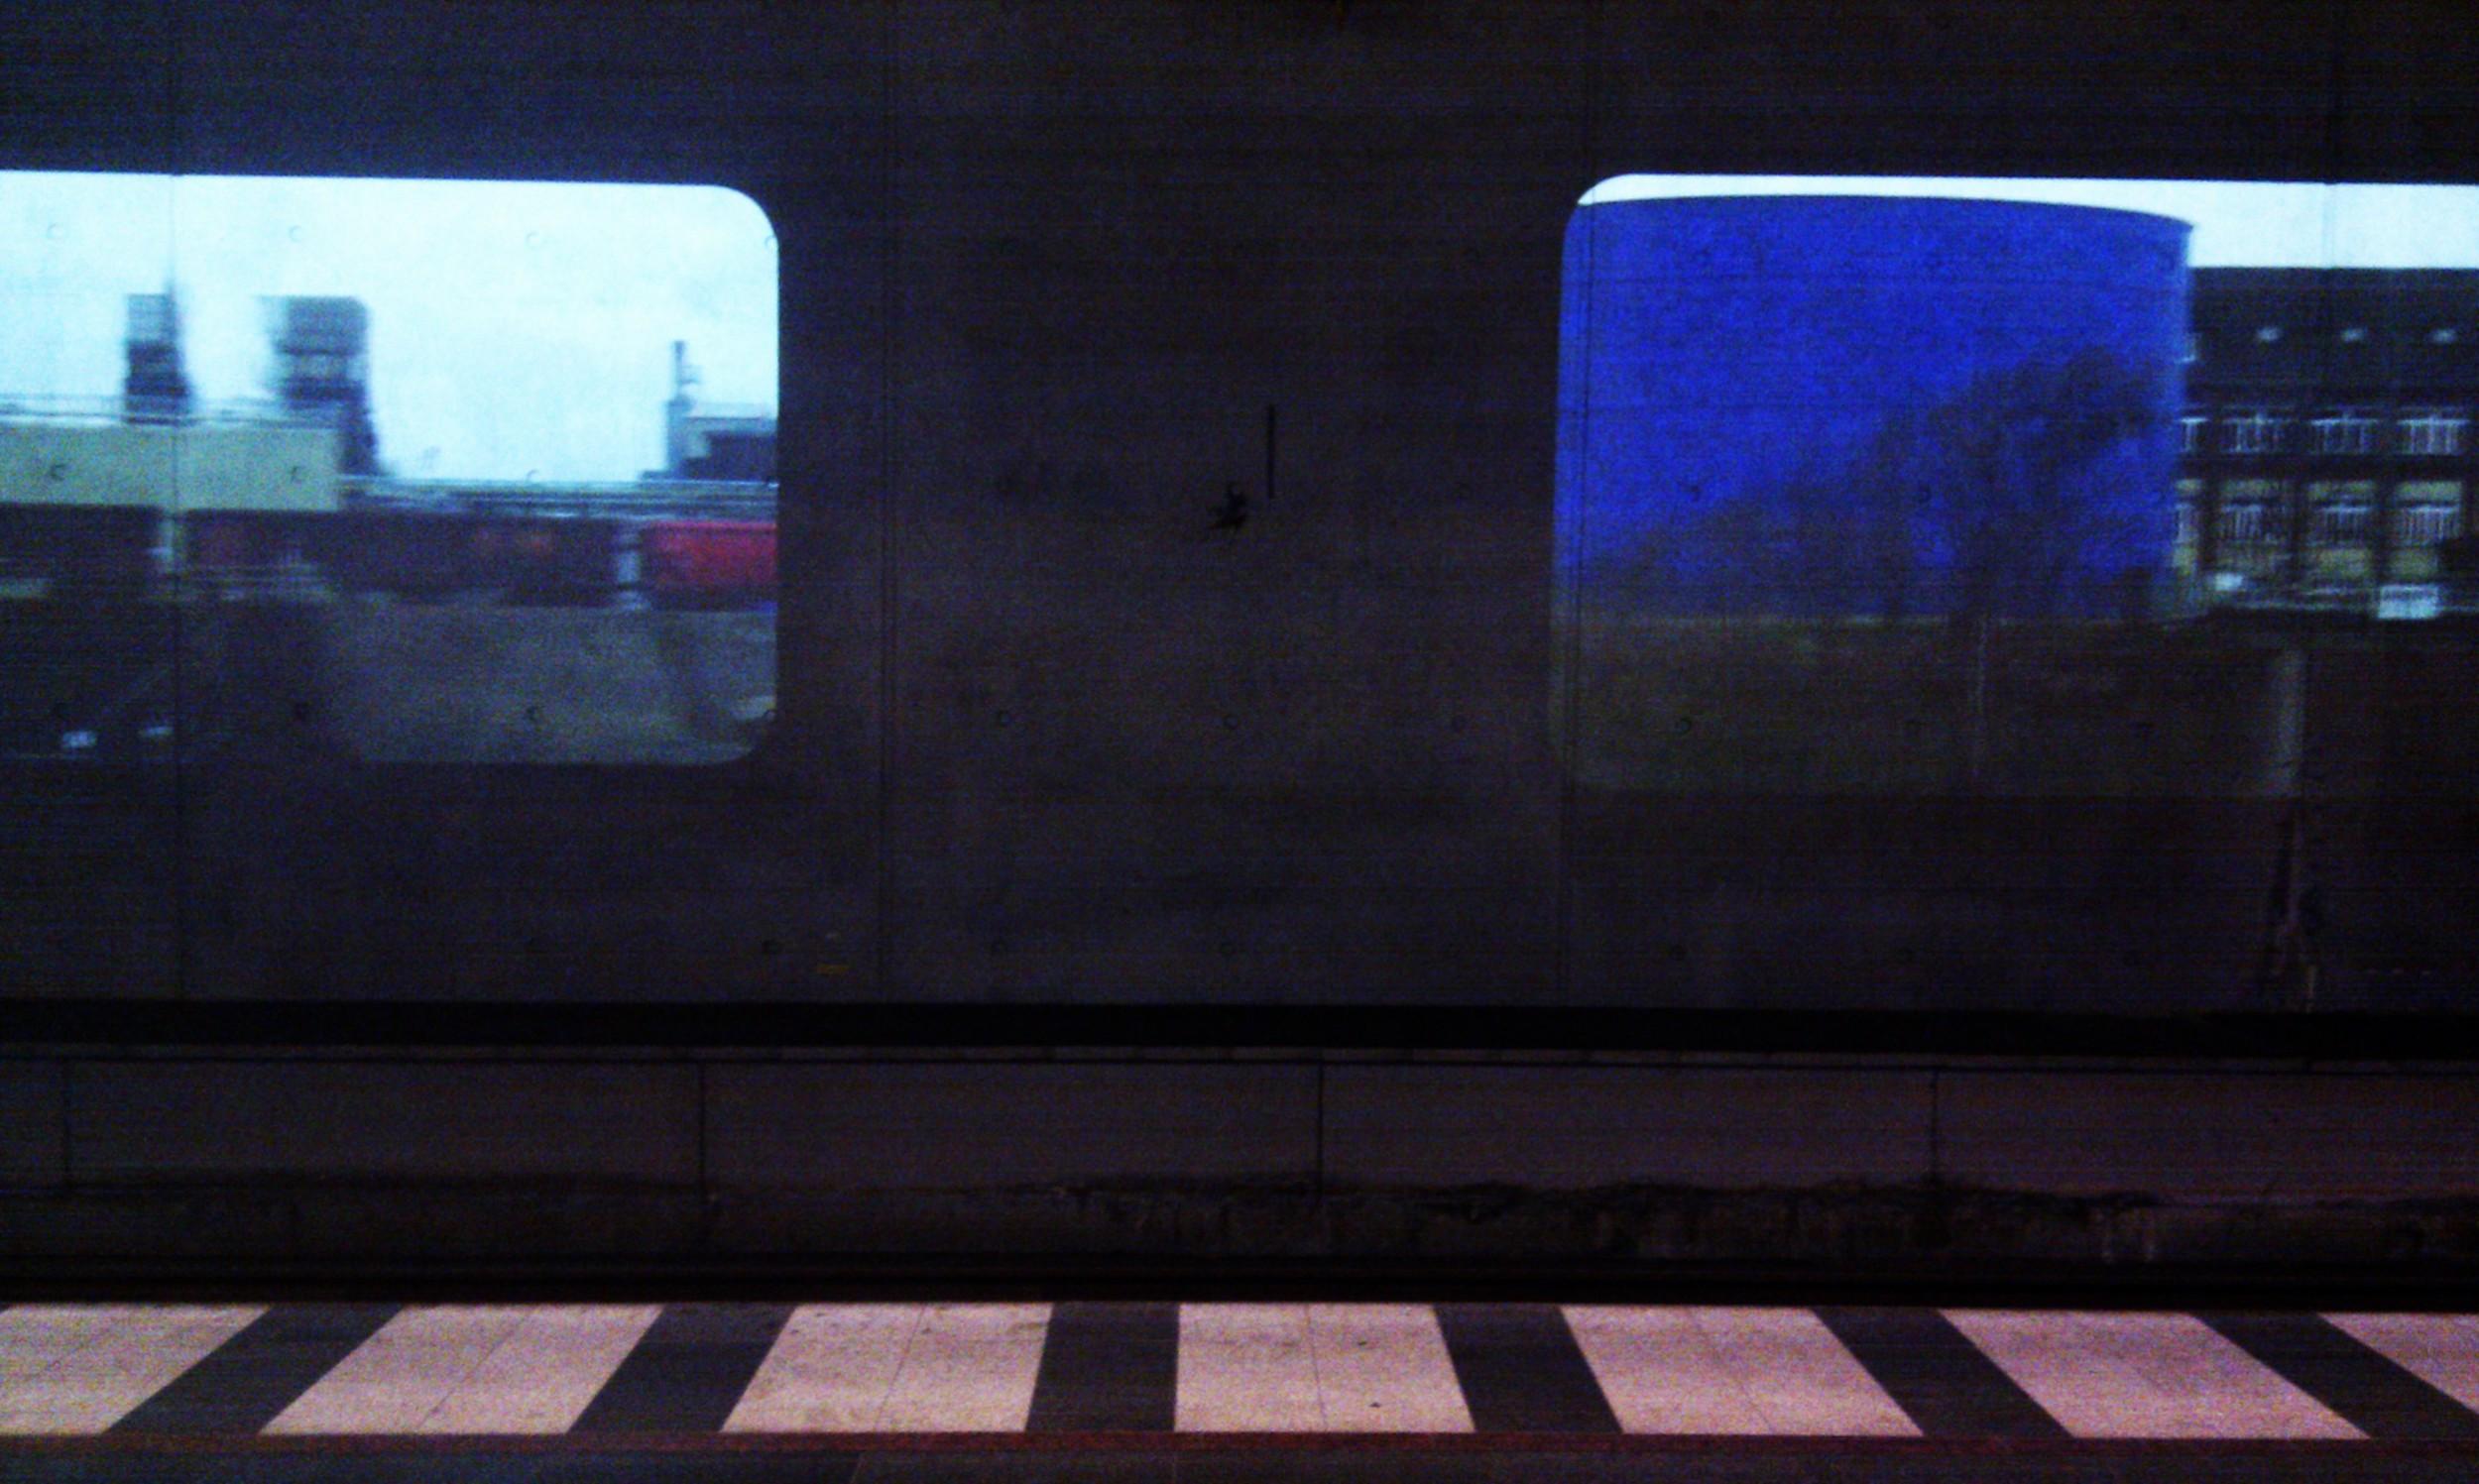 Platform projection at Malmo station